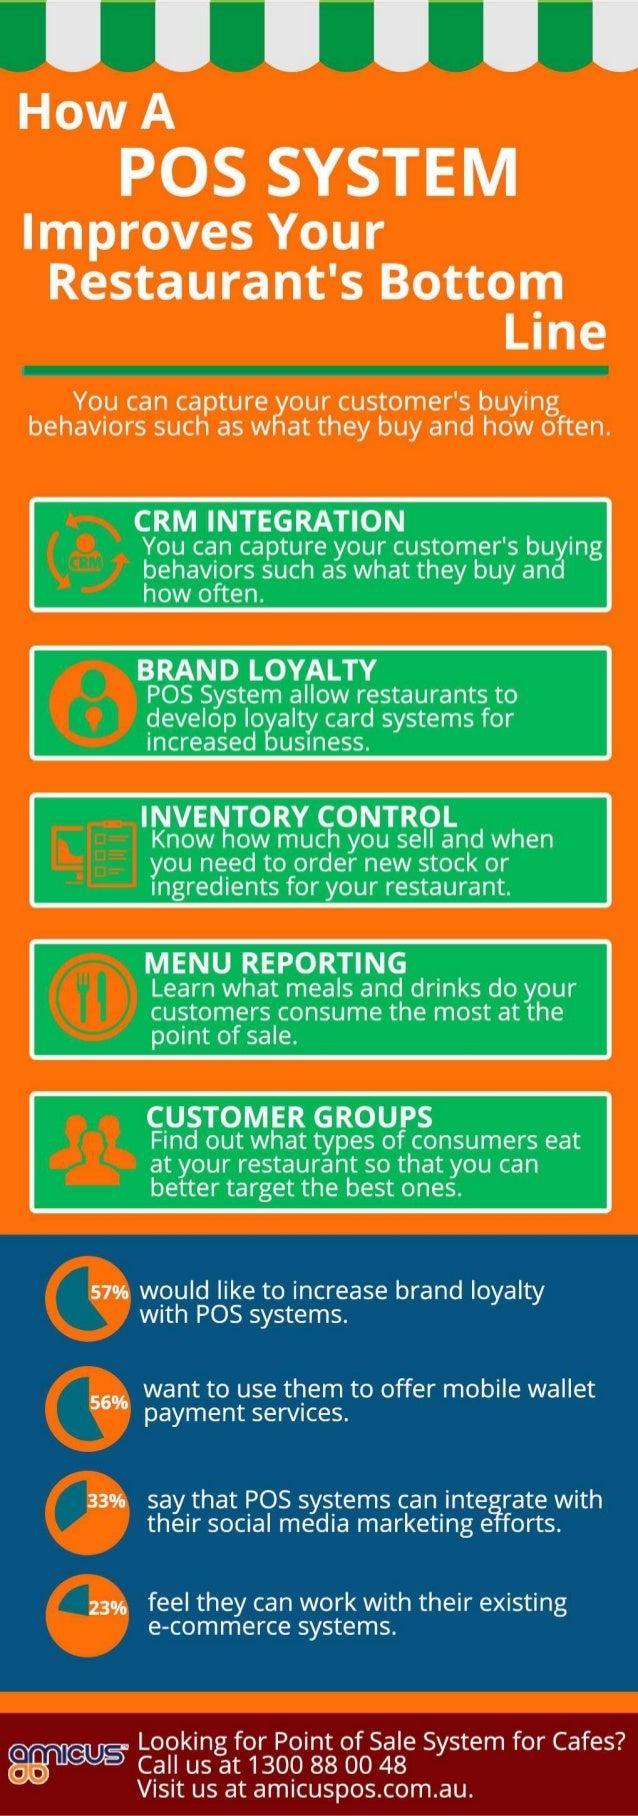 How a POS System Improves Your Restaurant's Bottom Line